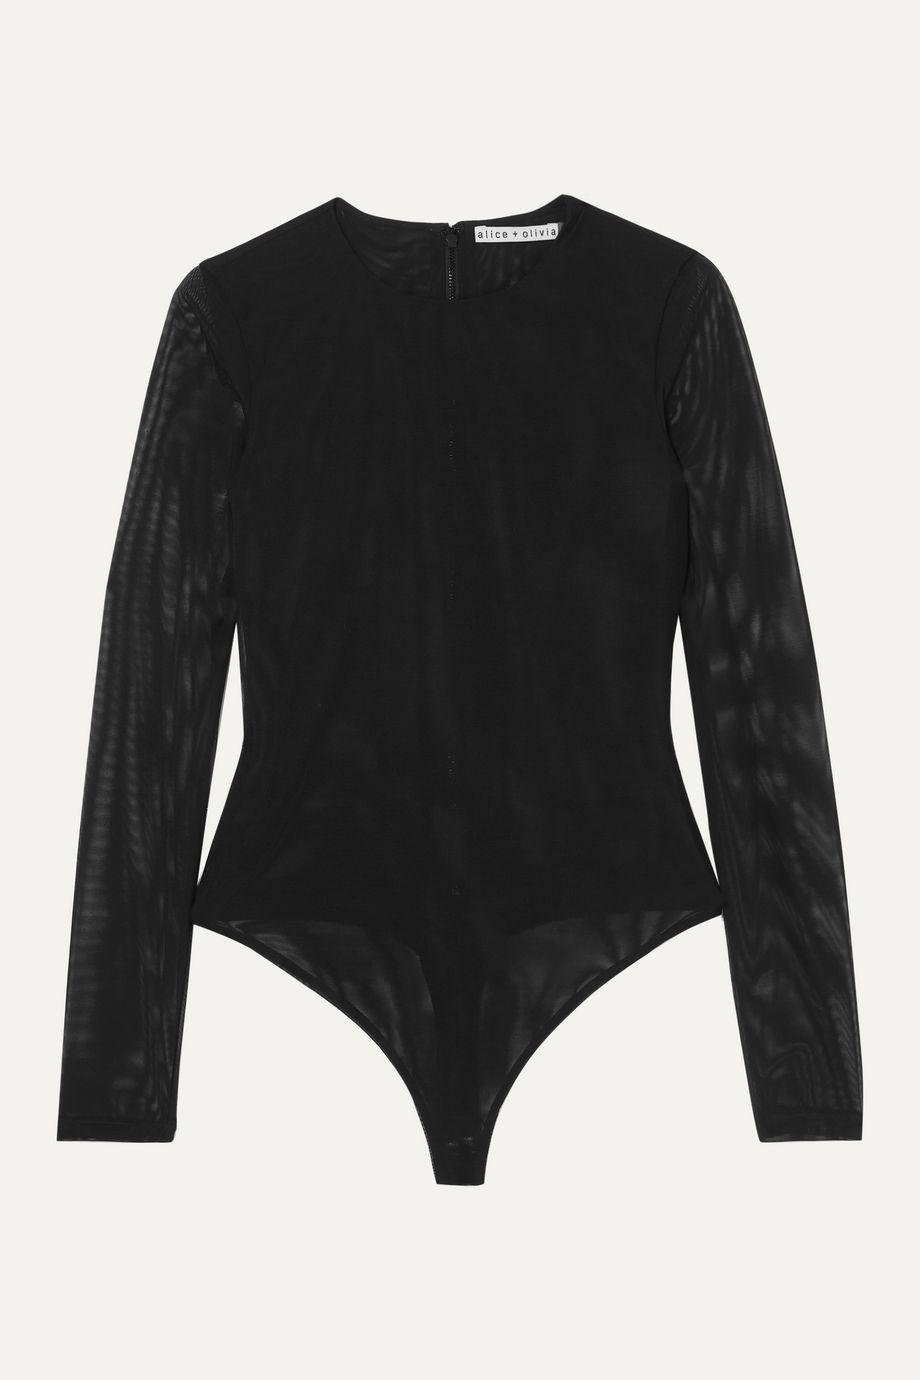 Alice + Olivia Nara stretch-mesh thong bodysuit